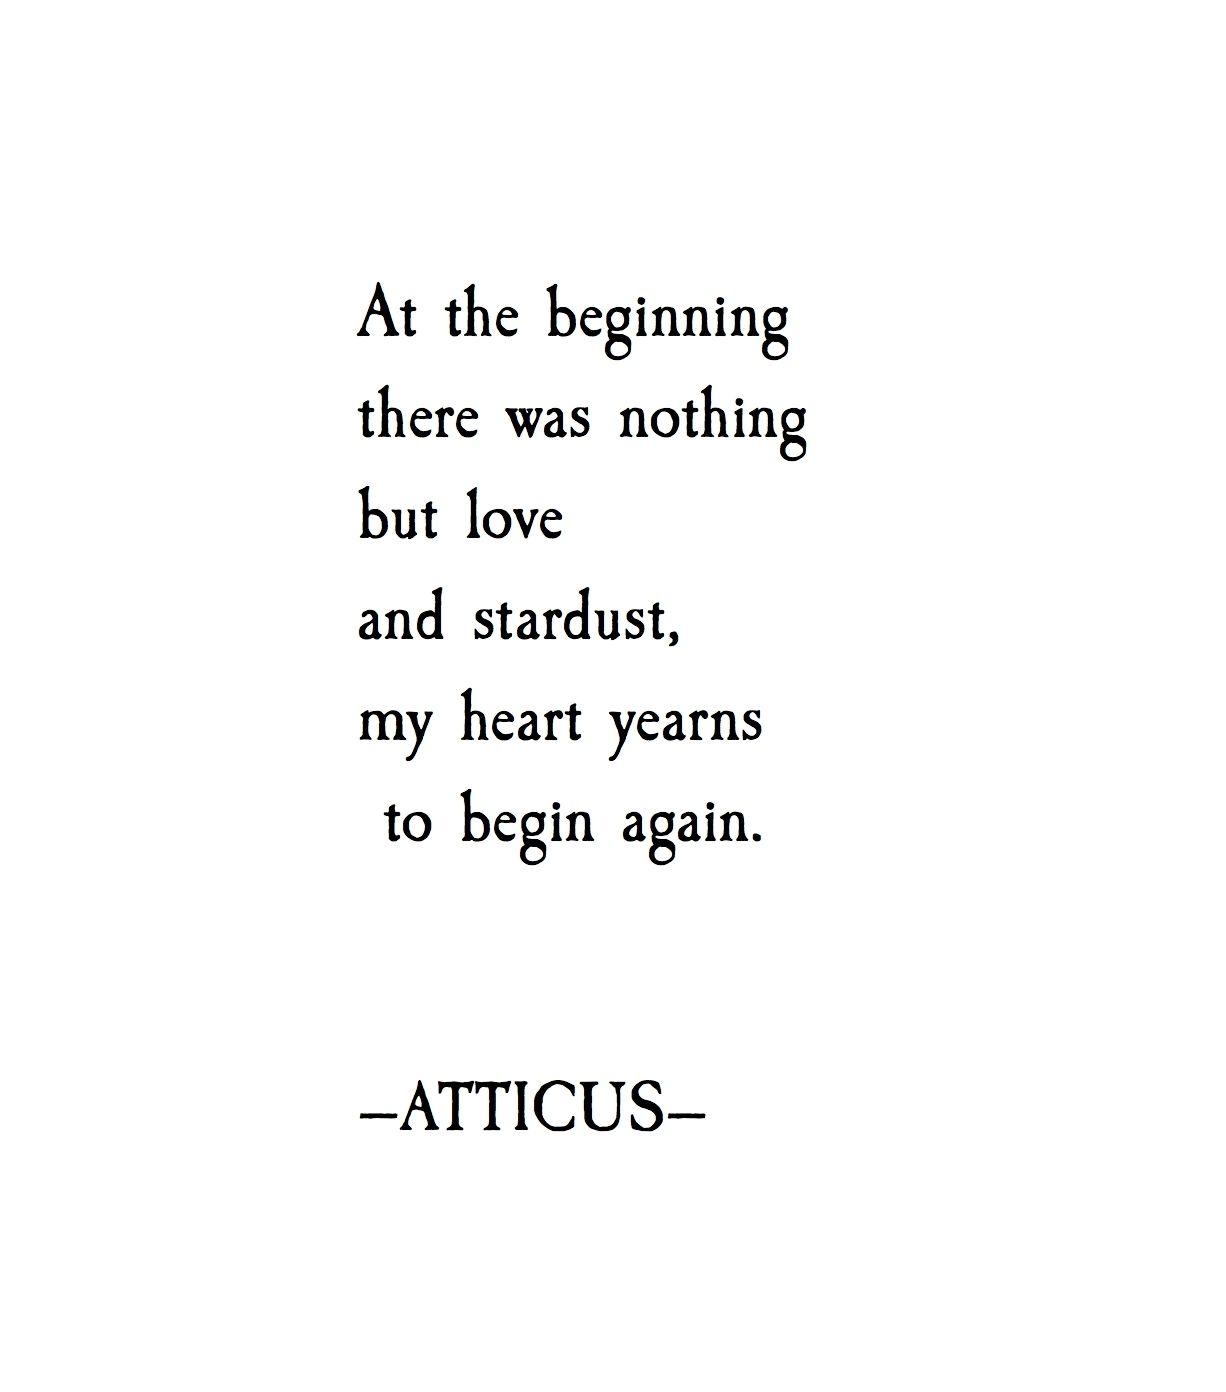 Begin Again Atticuspoetry Atticus Poetry Poem Loveherwild